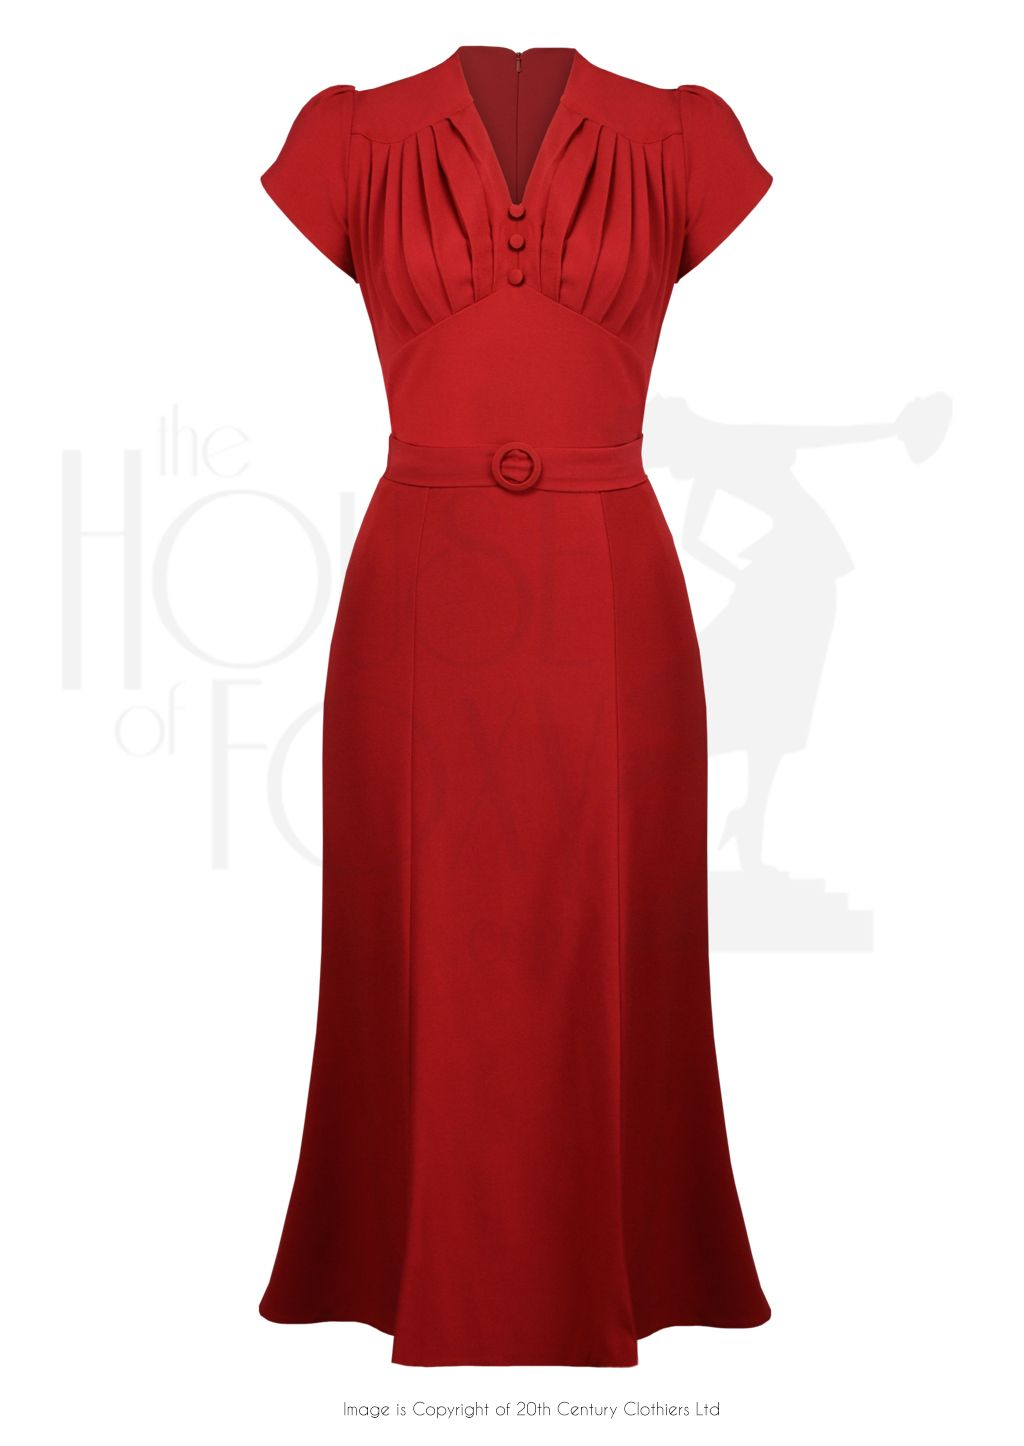 1930s Style Fashion Dresses So Foxy Retro Wiggle Dress Red 105 00 At Vintagedancer Com 1930s Fashion 1930s Fashion Dresses Deco Dress [ 1446 x 1024 Pixel ]